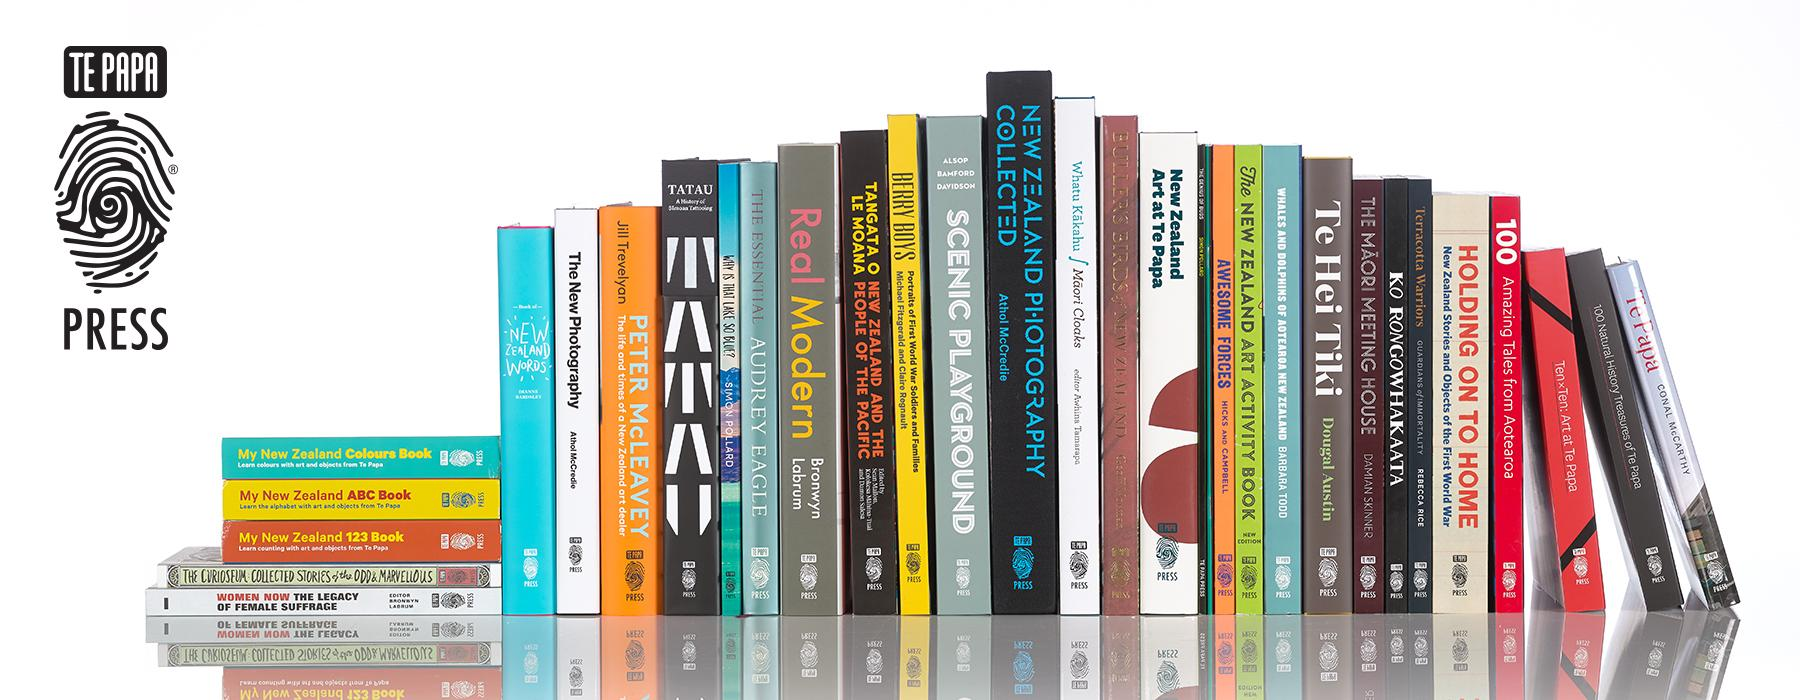 Selection of Te Papa Press titles, 2019. Photograph by Maarten Holl. Te Papa.